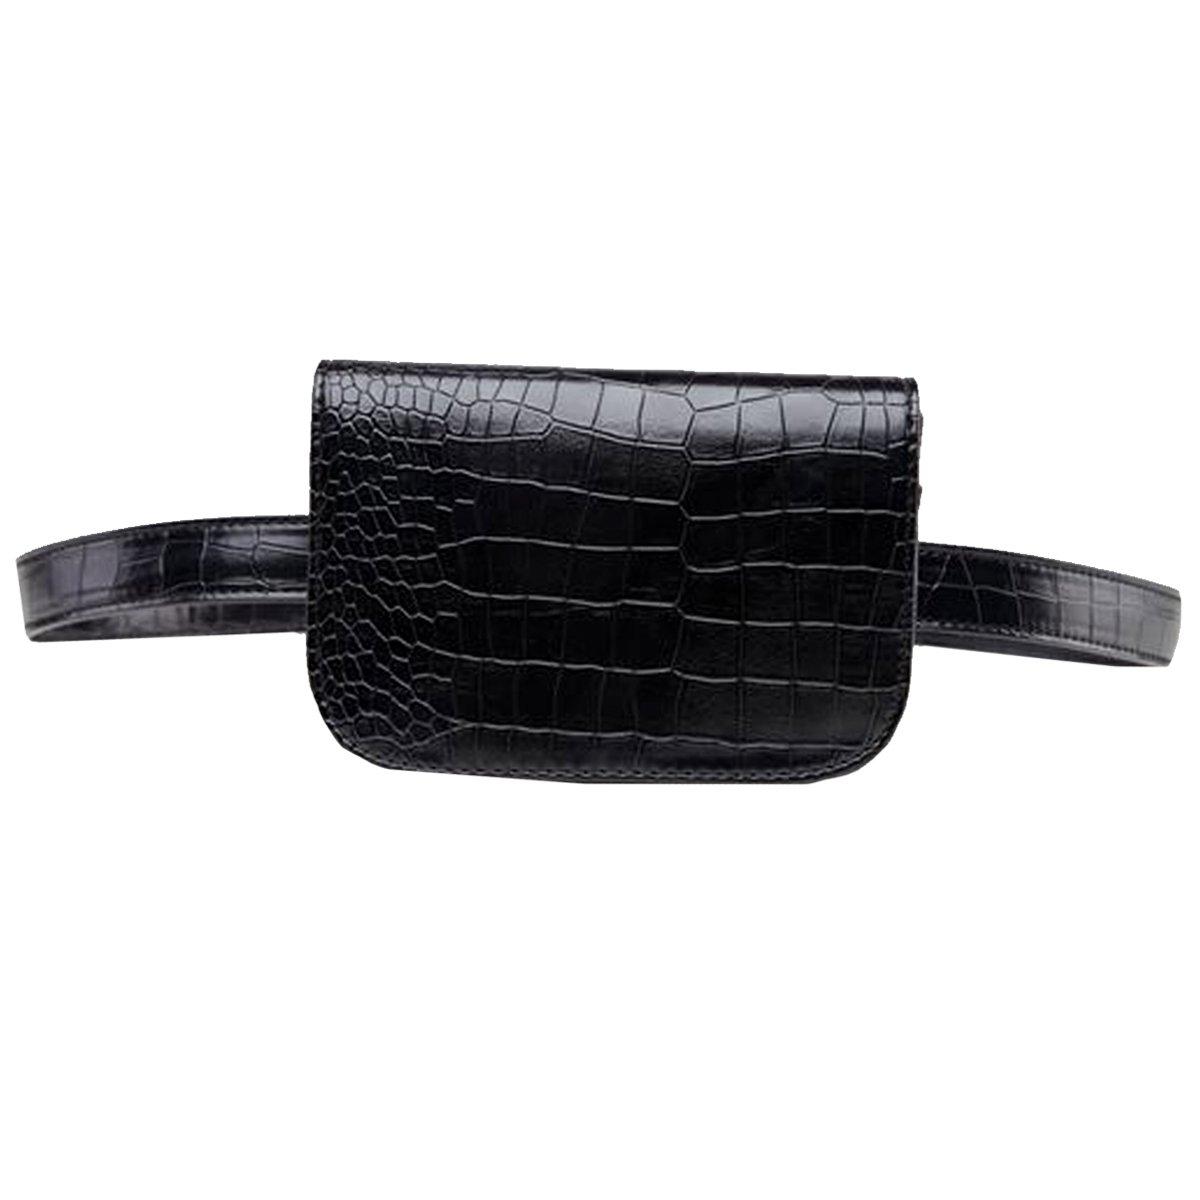 Kennedy Fashion Women Waist Bag Leather Fanny Packs Elegant Crocodile Stripes Pattern Travel Cell Phone Bag -Medium by Kennedy Manufacturing